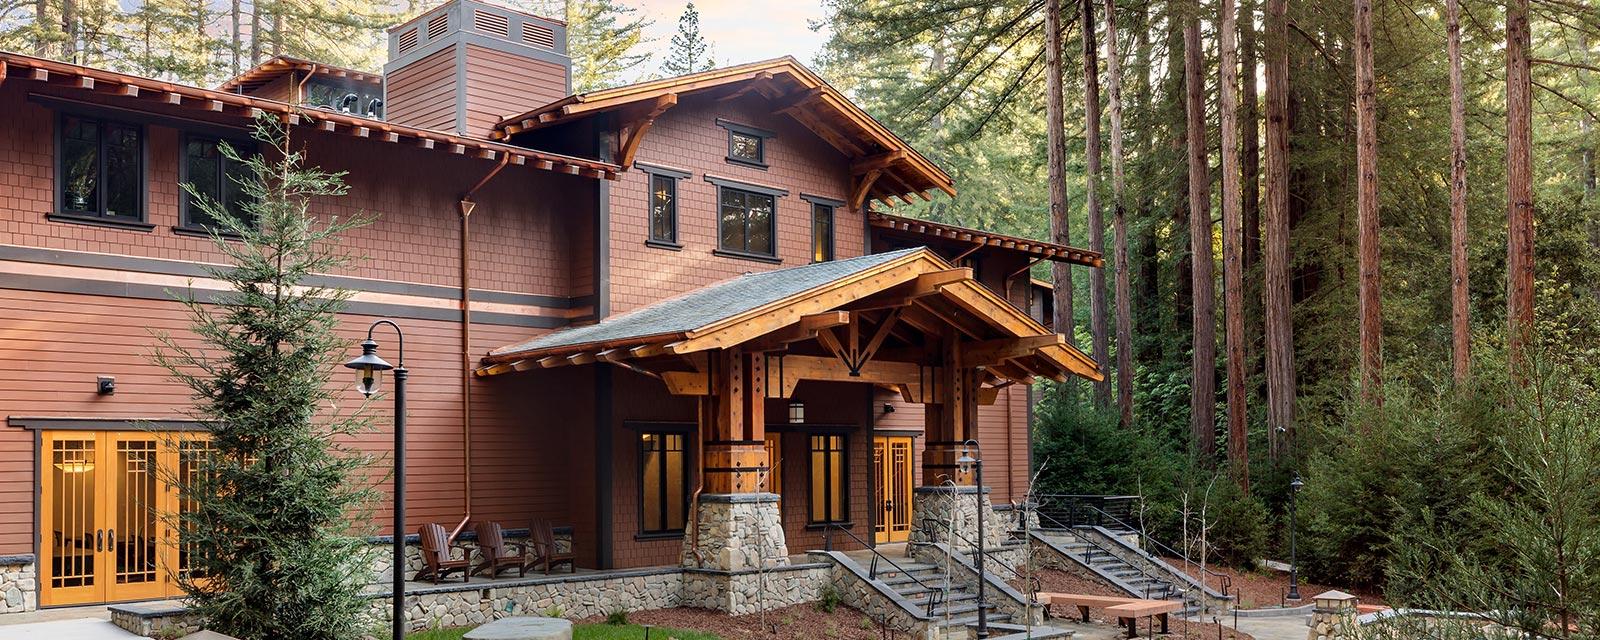 1440-Redwood-Back-Day (1).jpg